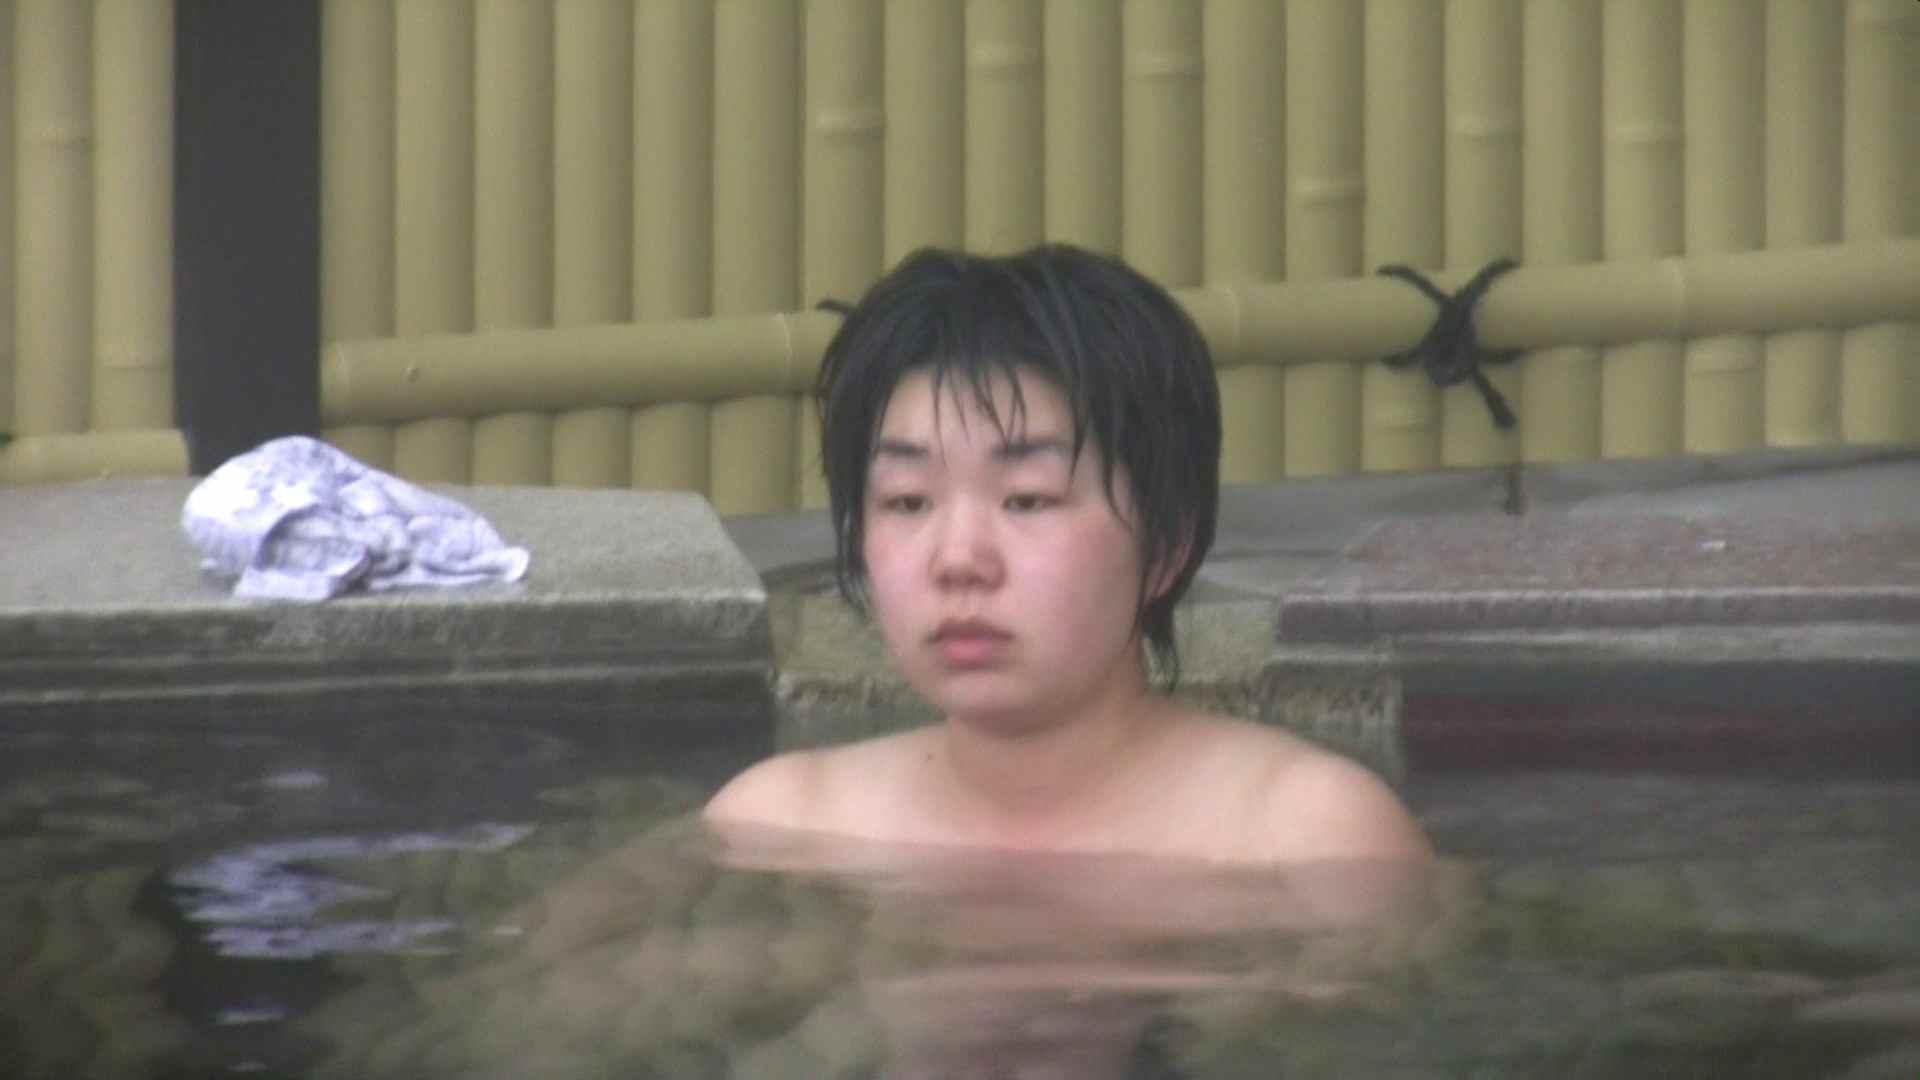 Aquaな露天風呂Vol.53【VIP限定】 女体盗撮 | OL女体  93連発 19